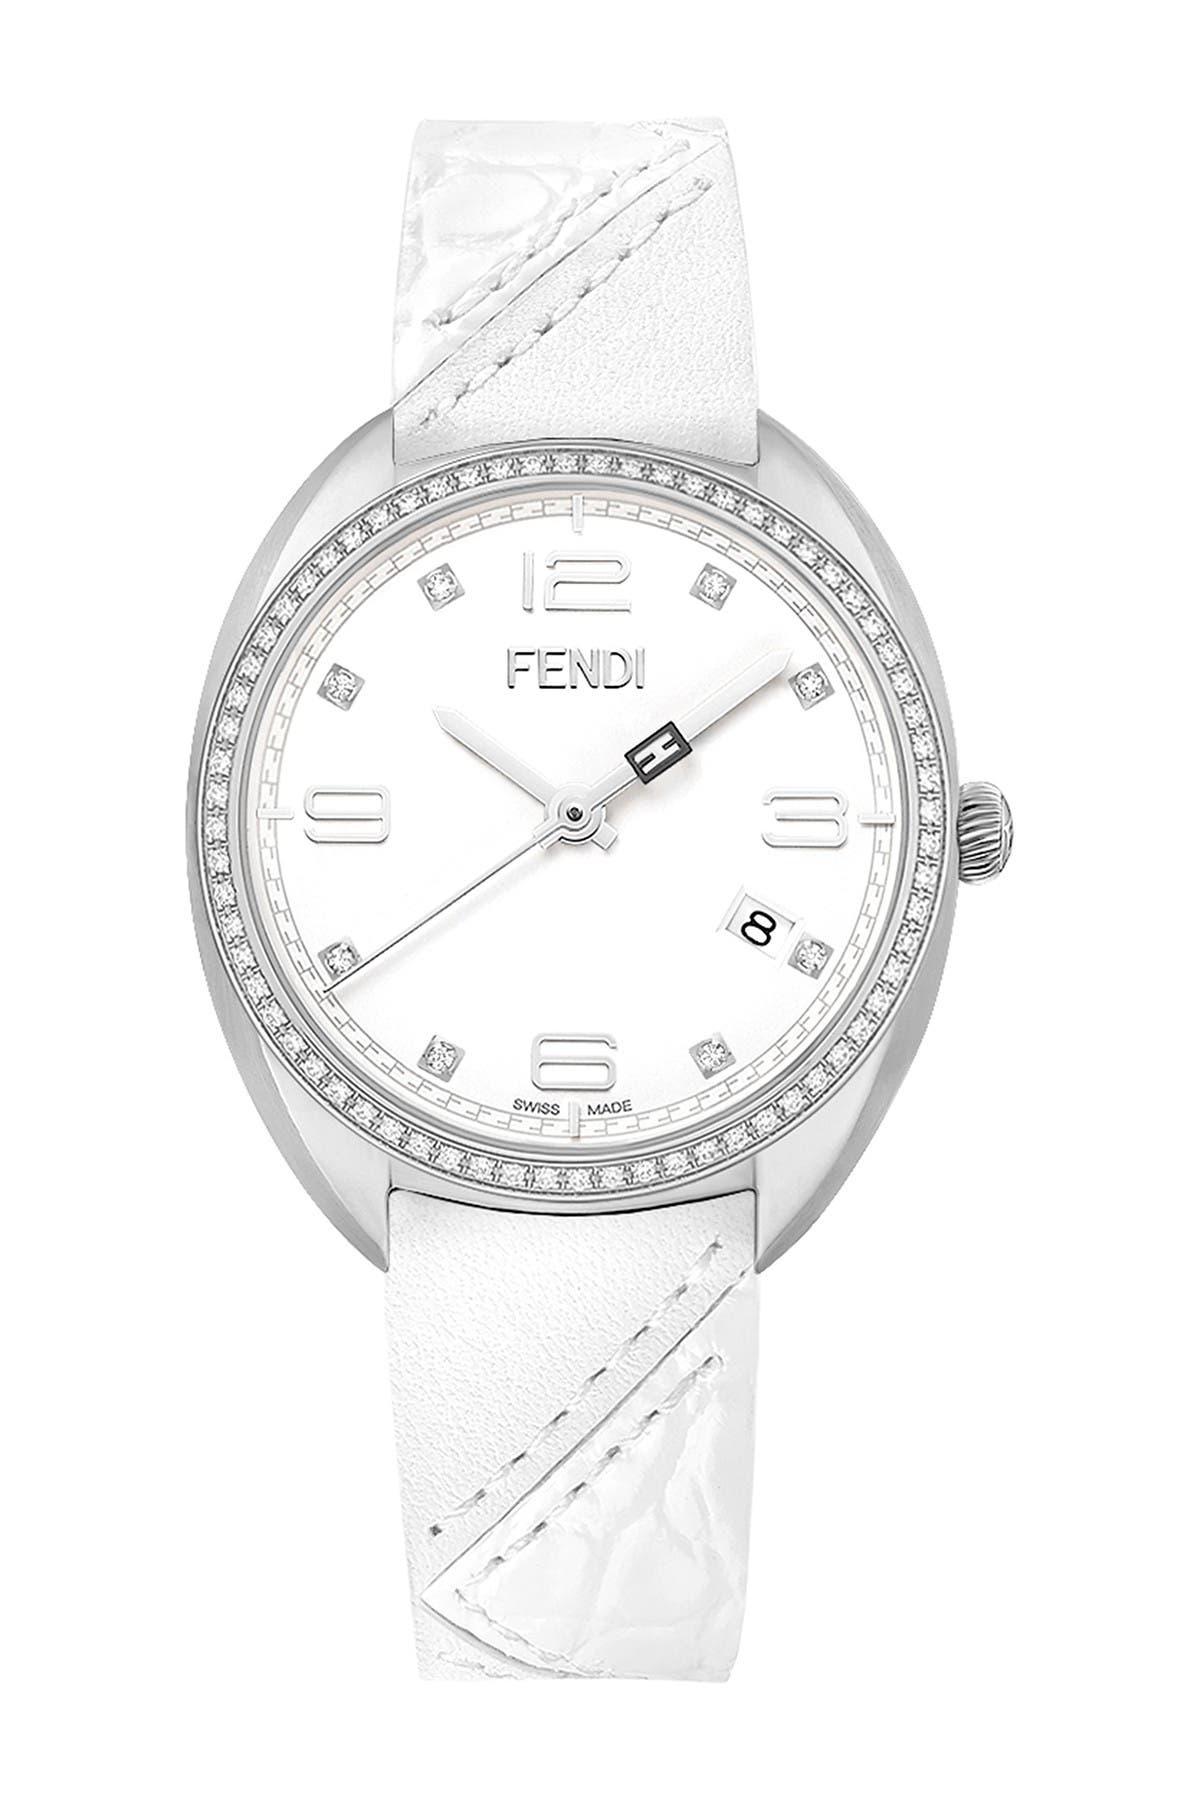 Image of FENDI Women's Momento Fendi Diamond Bezel Leather Strap Watch, 34mm - 0.35 ctw